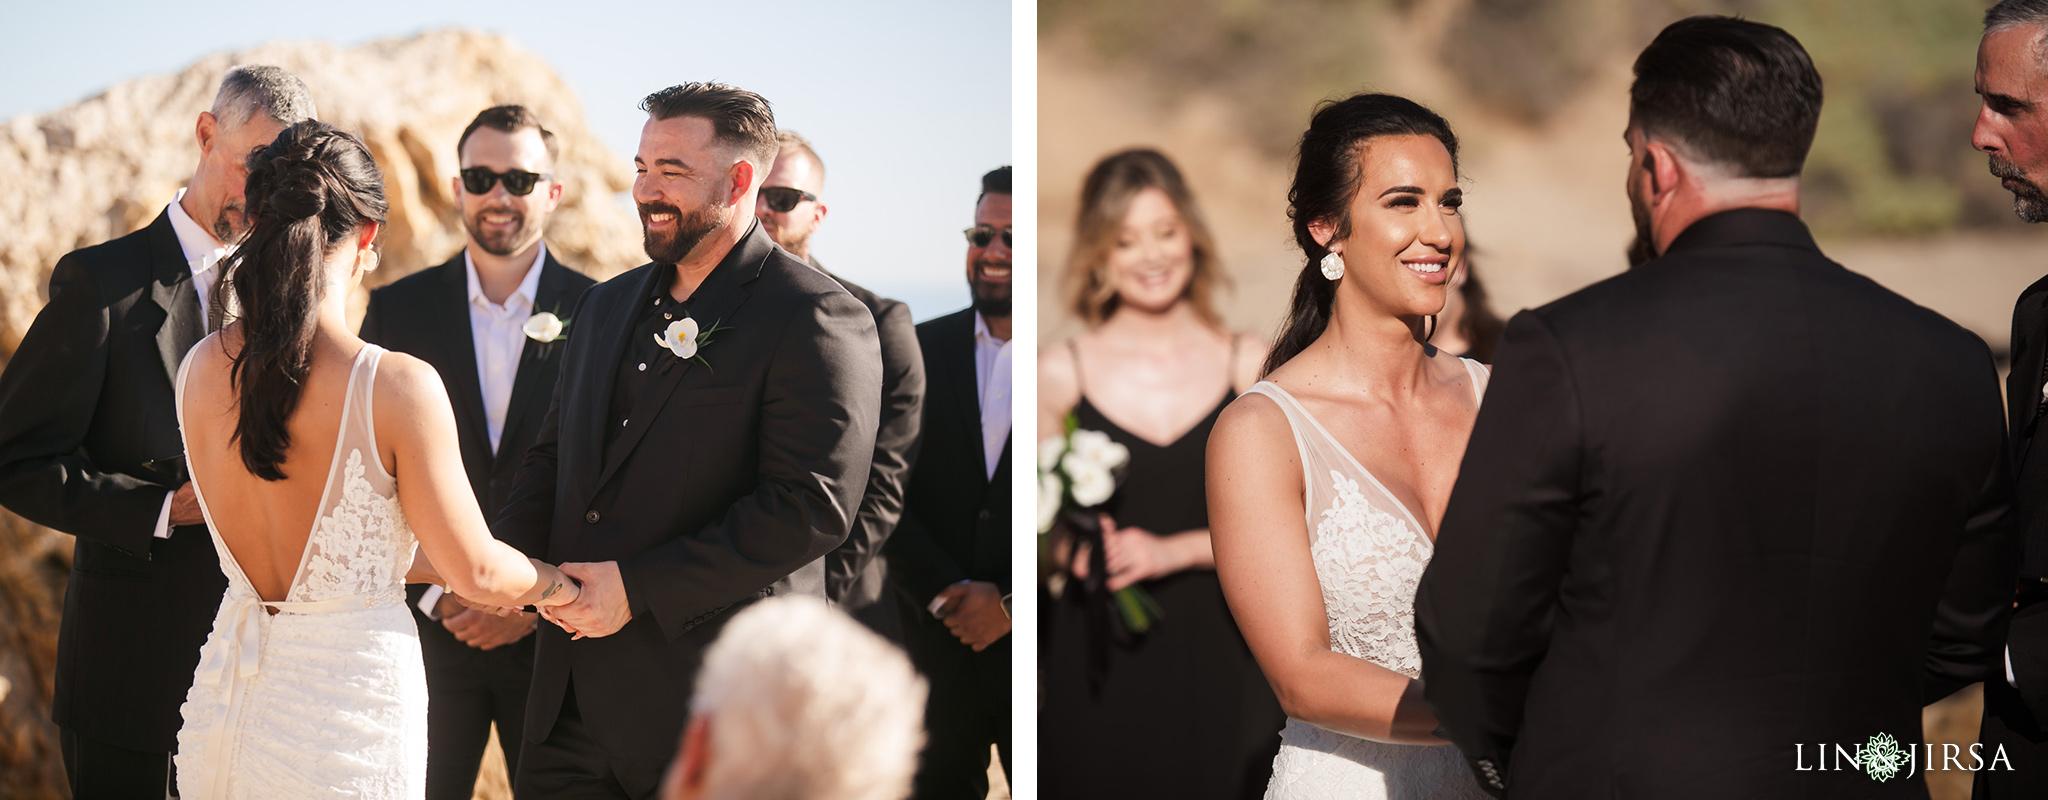 20 Crystal Cove State Park Laguna Beach Wedding Photography